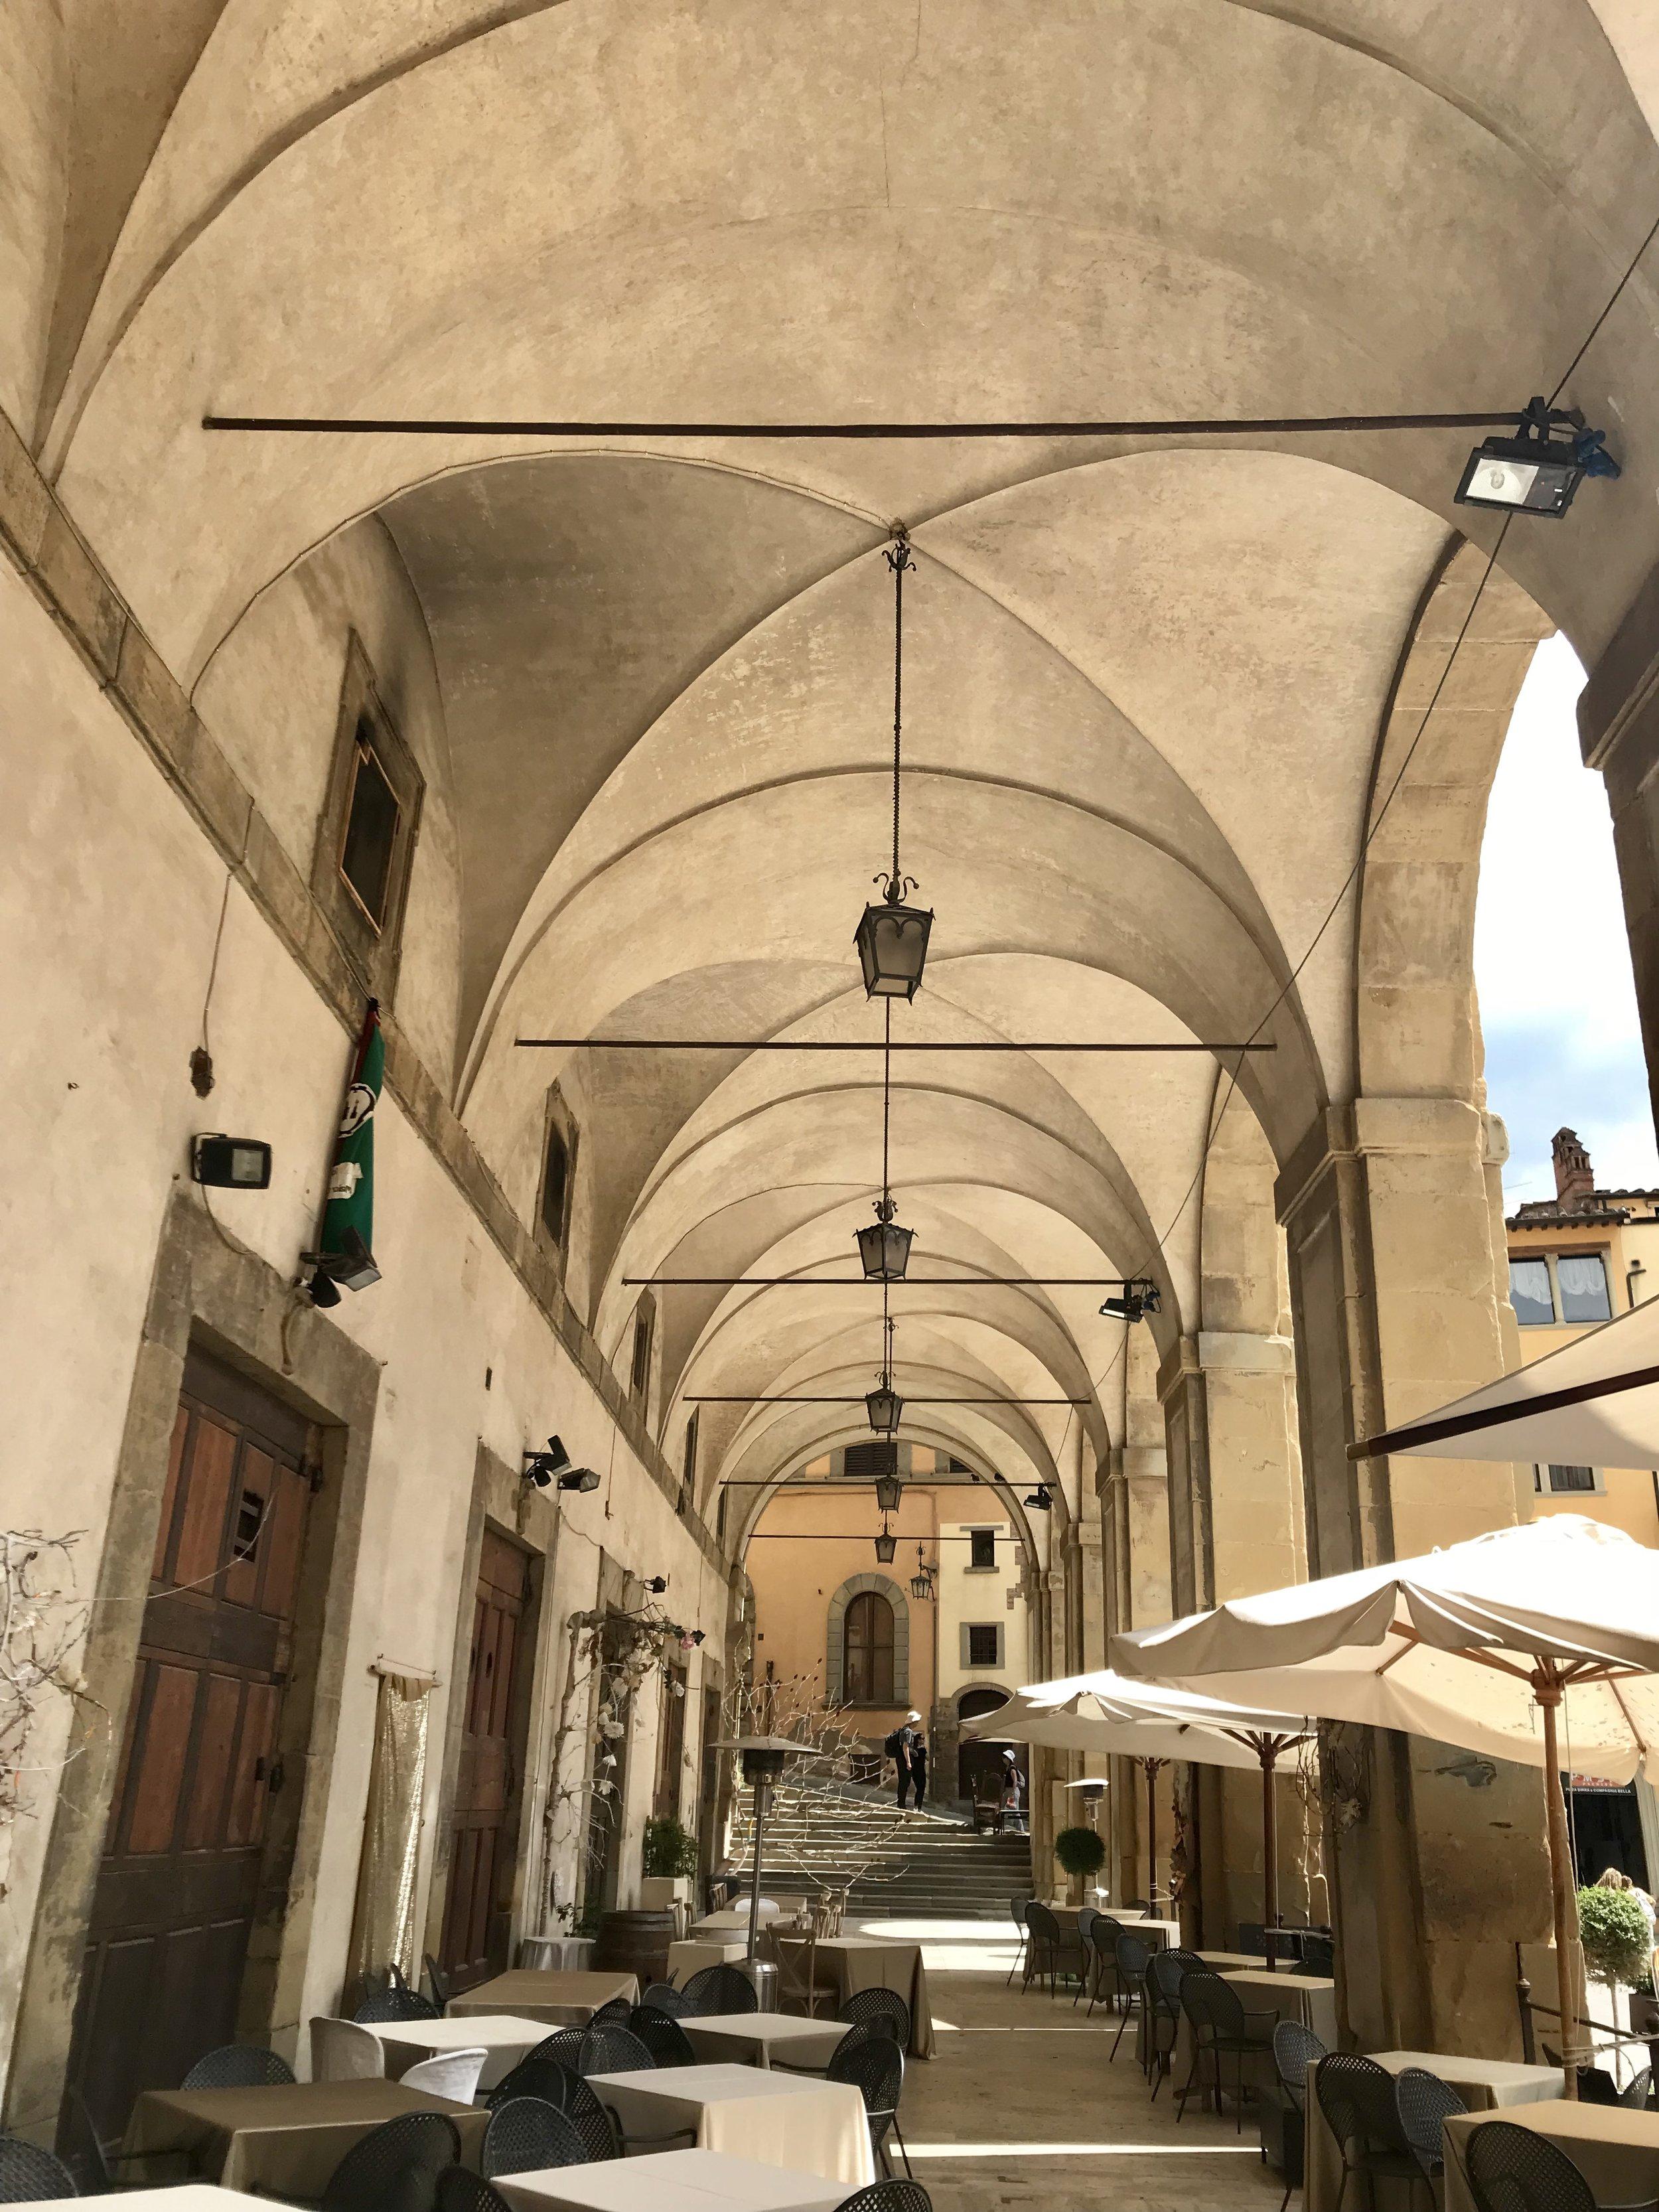 The loggia of the main piazza in Arezzo was designed by Vasari.